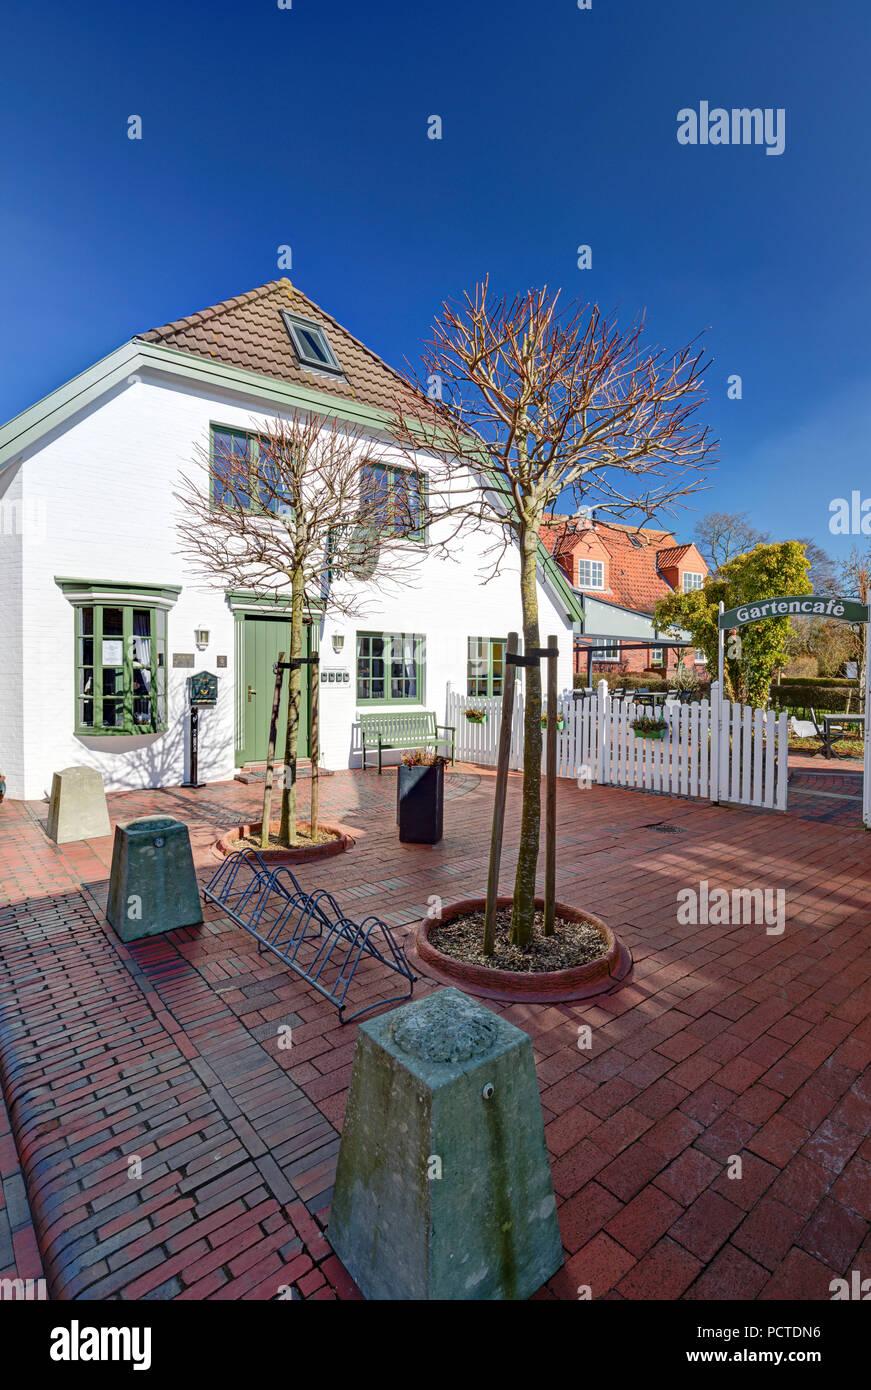 Witthus, Hotel, Restaurant, house facade, Greetsiel, East Frisia, Lower Saxony, Germany, Stock Photo